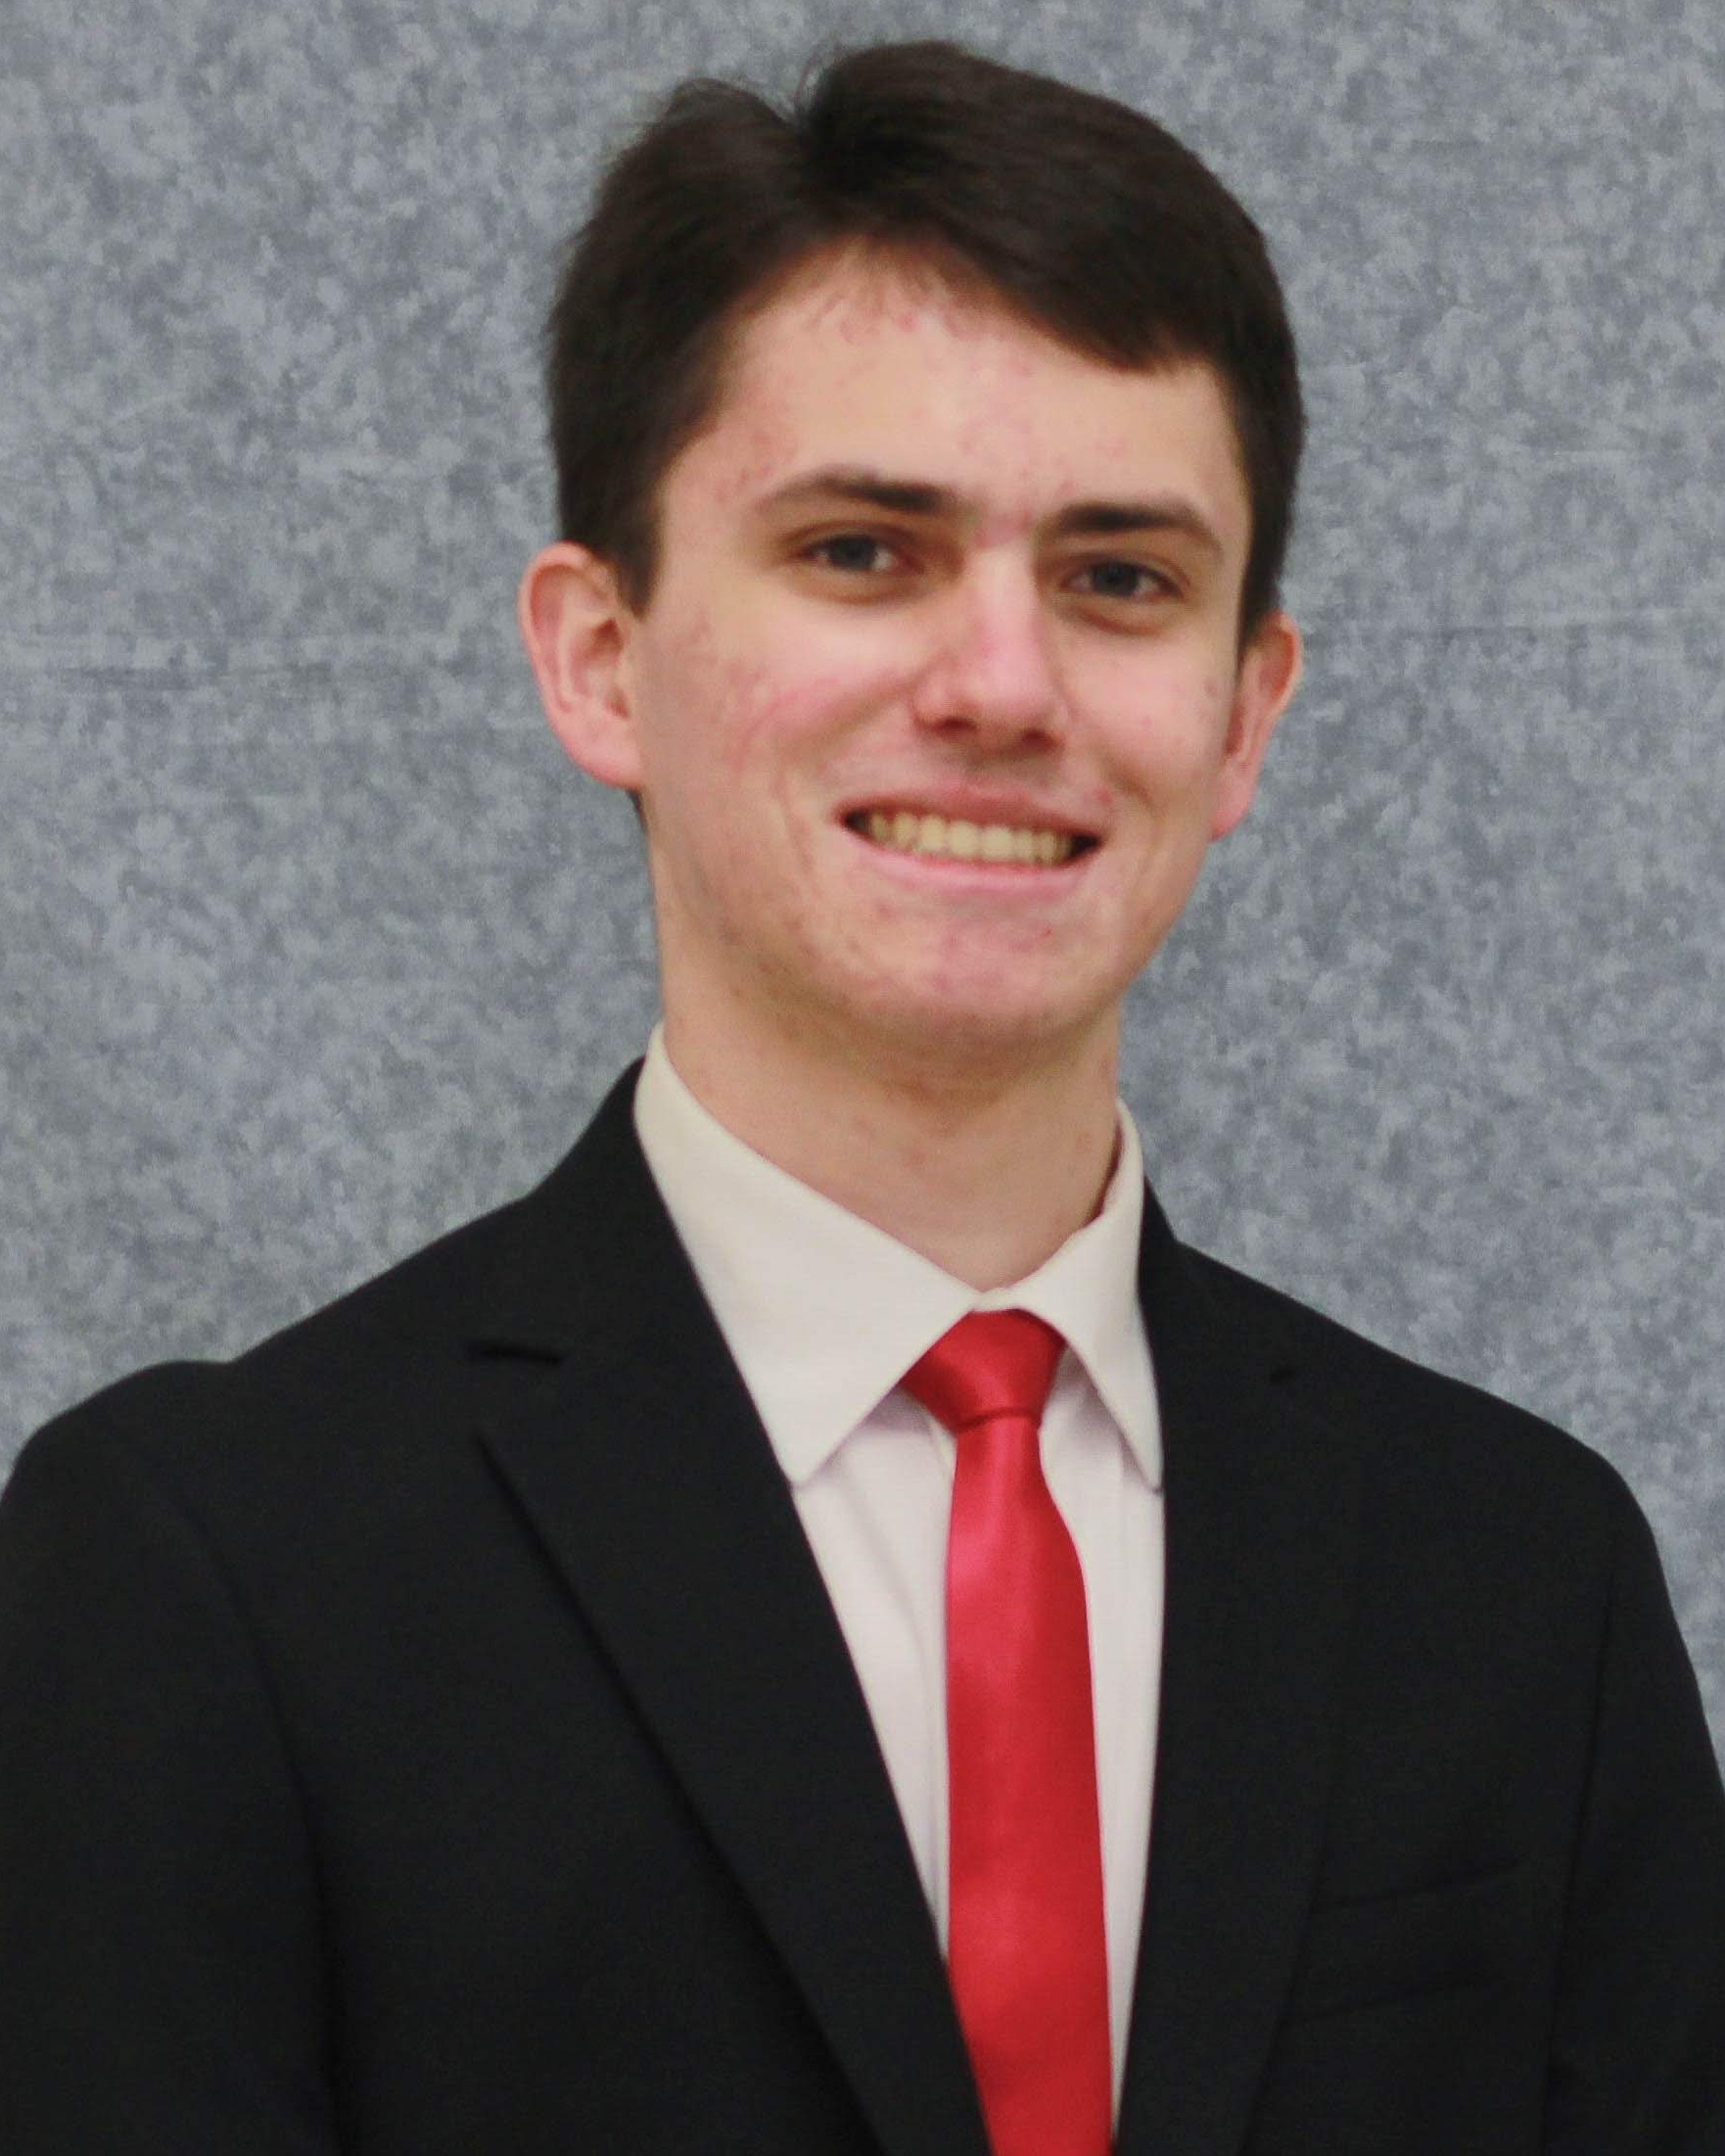 Daniel Wright - Academic Chair